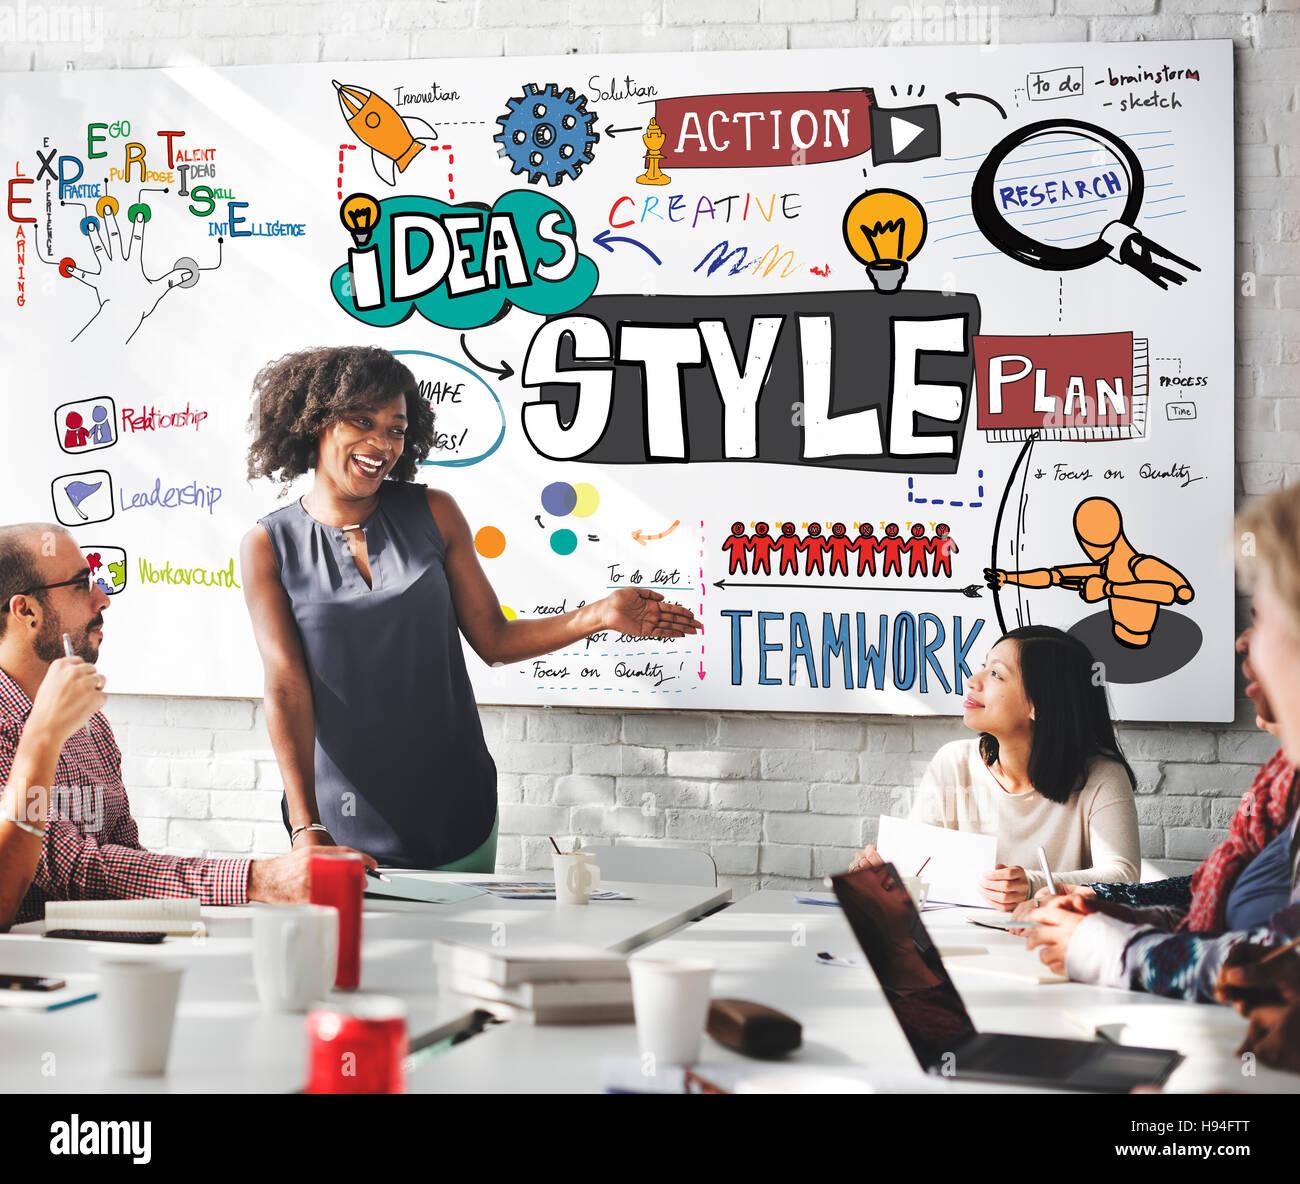 Style Design Decoration Posh Trends Vogue Chic Concept - Stock Image